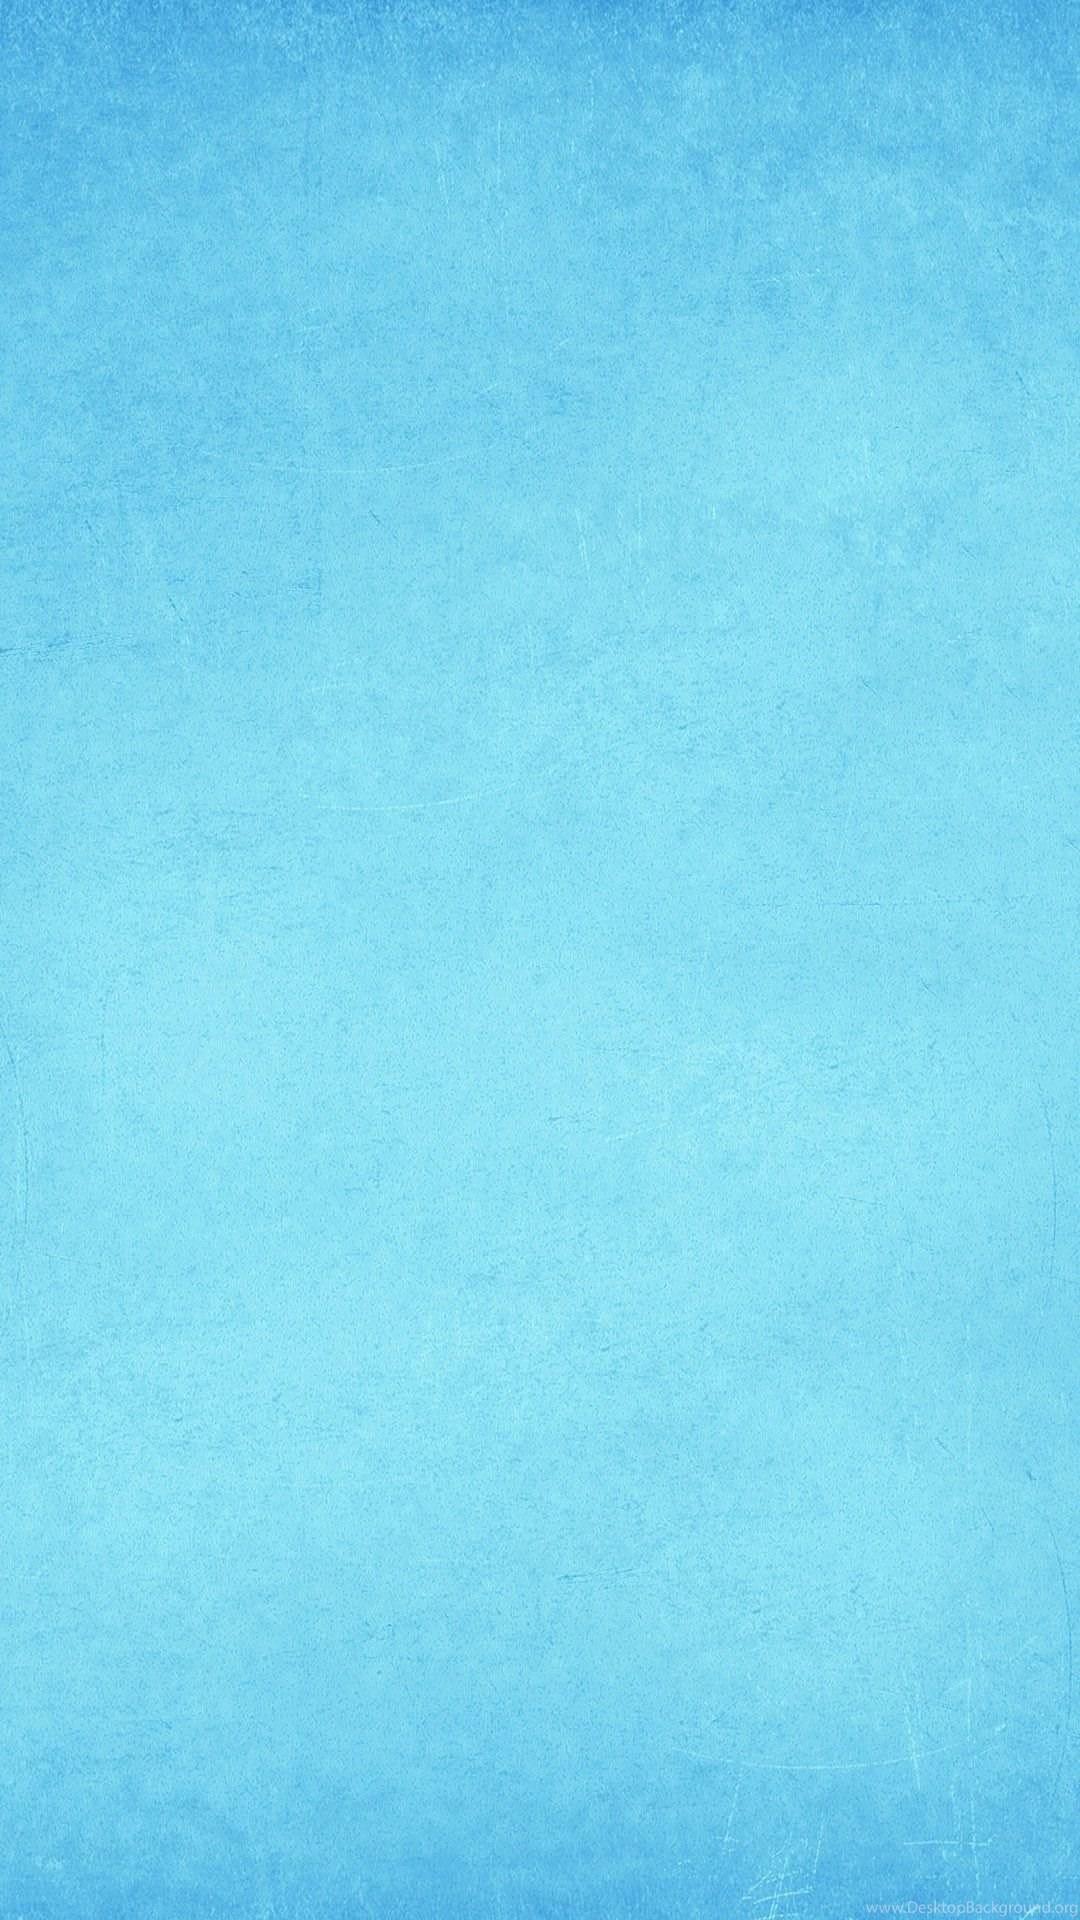 Light Blue Texture Mobile Wallpapers 6482 Desktop Background